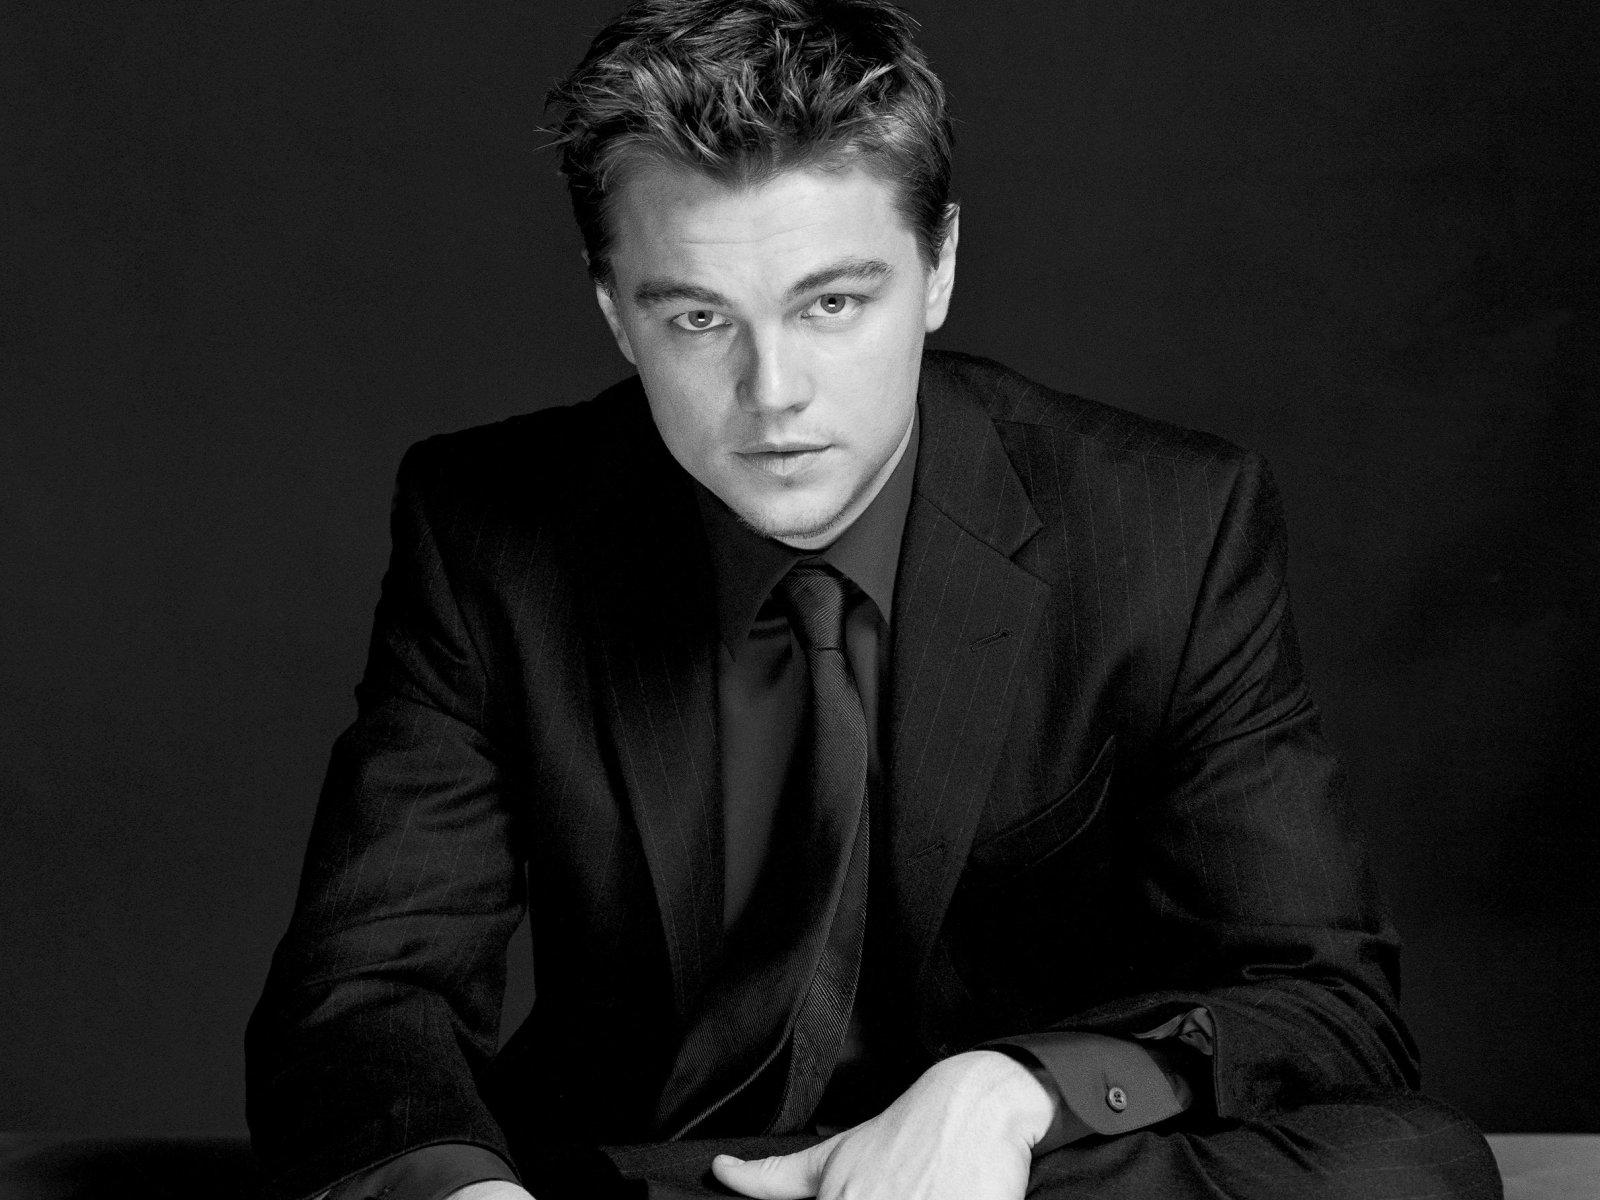 http://4.bp.blogspot.com/-E5ONeug_u2I/TzJgfTC0R1I/AAAAAAAABnQ/3OMzxypa5J0/s1600/kinopoisk.ru-Leonardo-DiCaprio-431433--w--1600.jpg